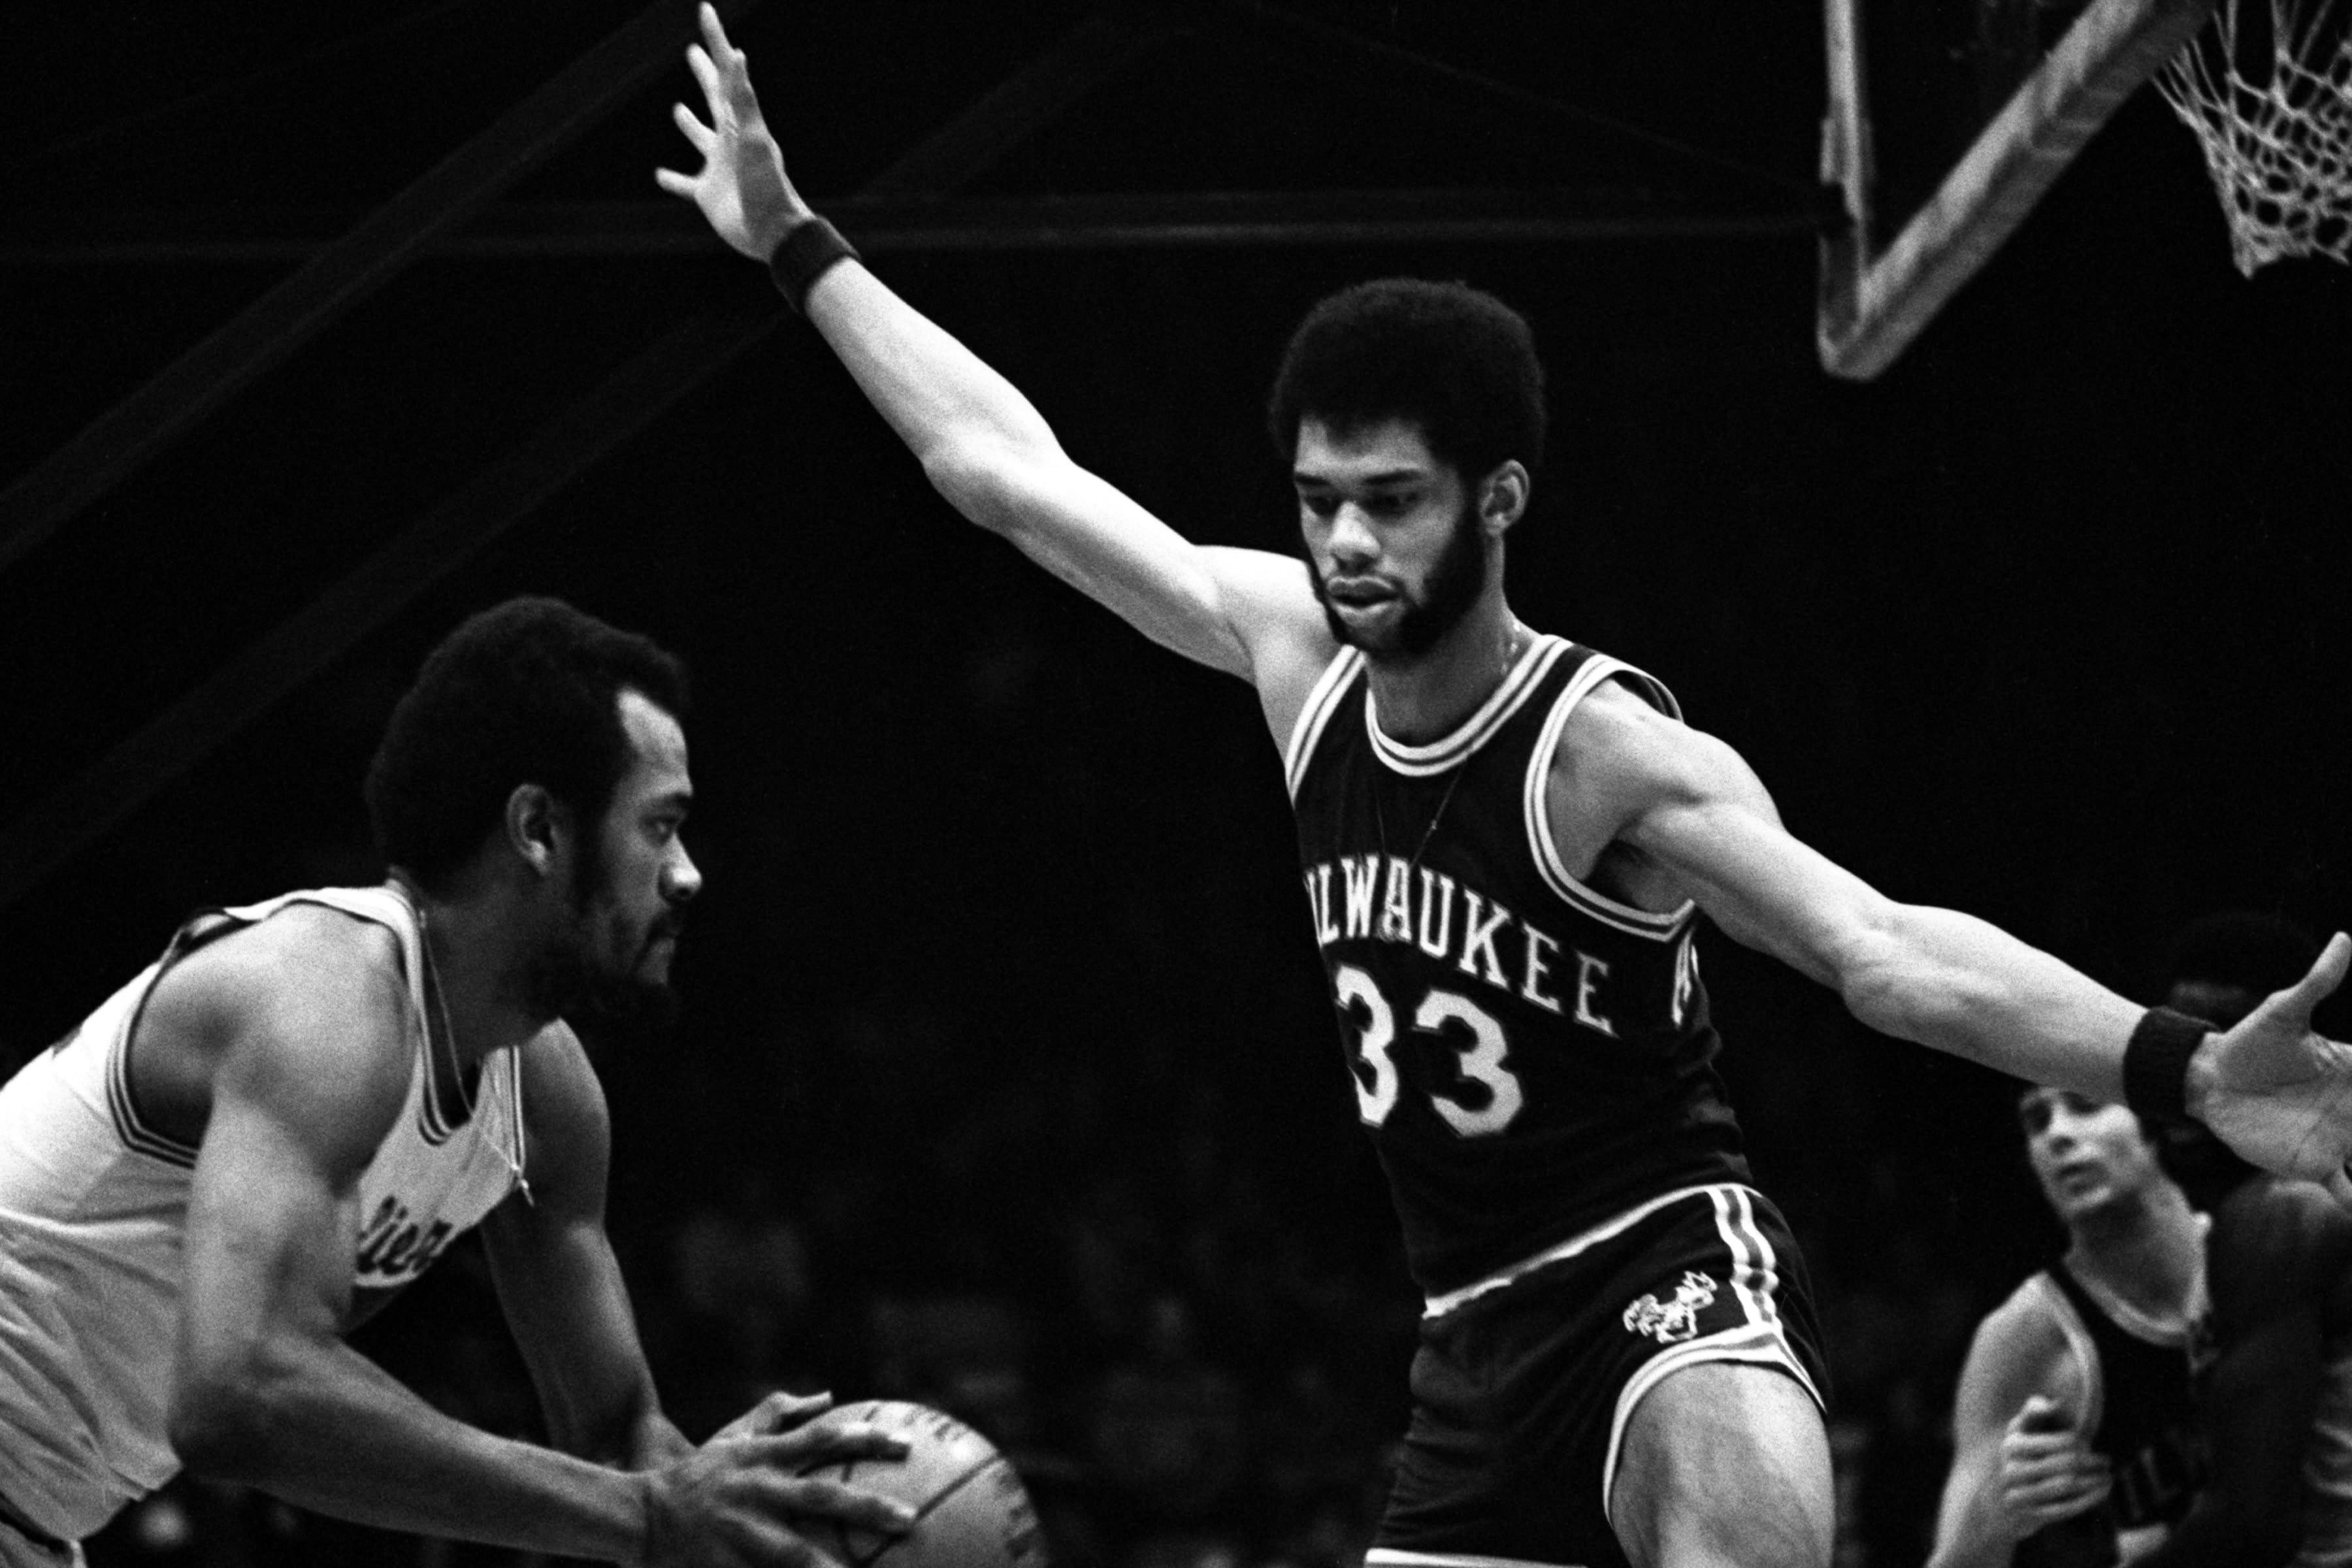 Milwaukee Bucks, Kareem Abdul-Jabbar